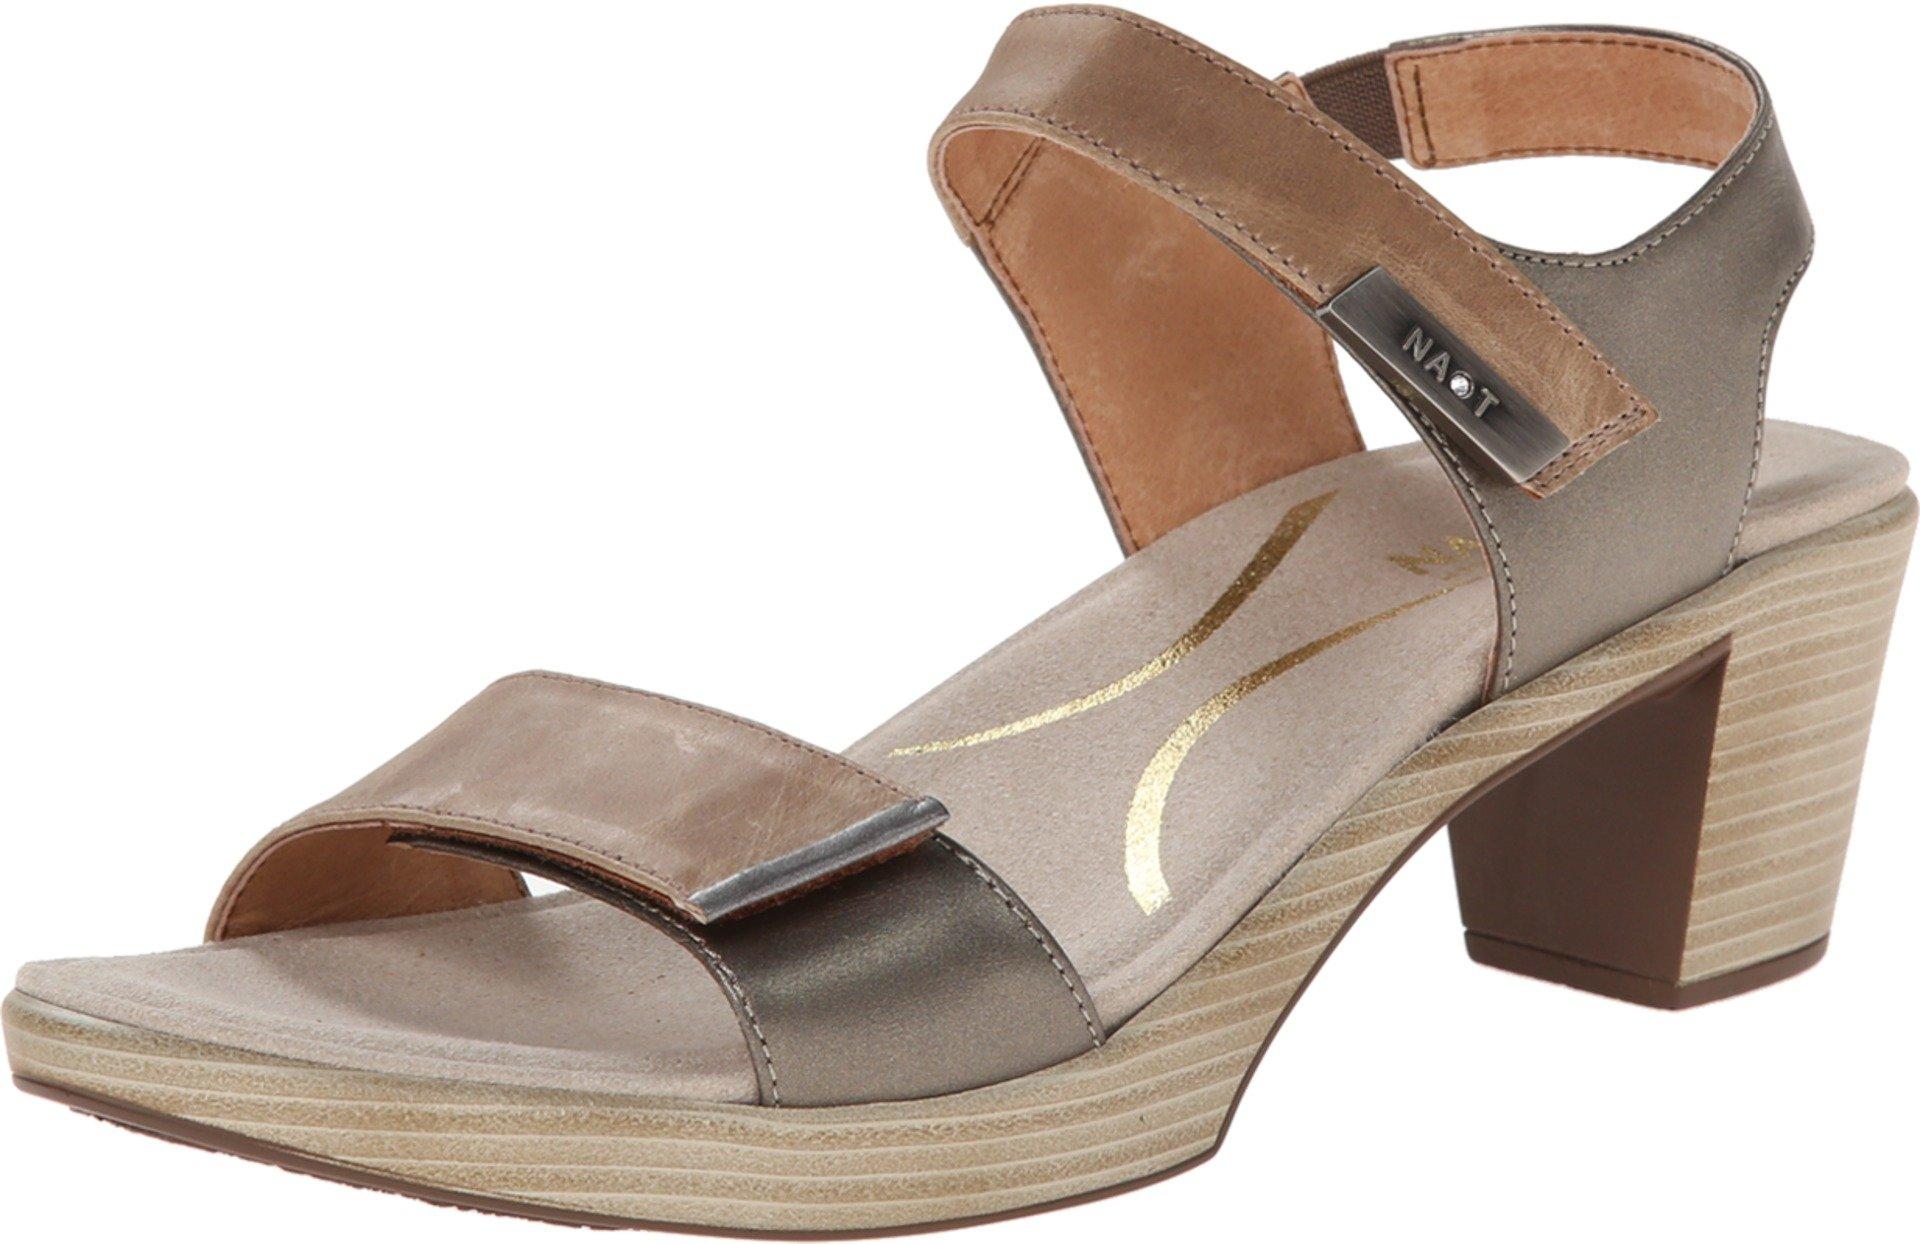 Naot Women's Intact Dress Sandal, Khaki Beige, 39 EU/8 M US